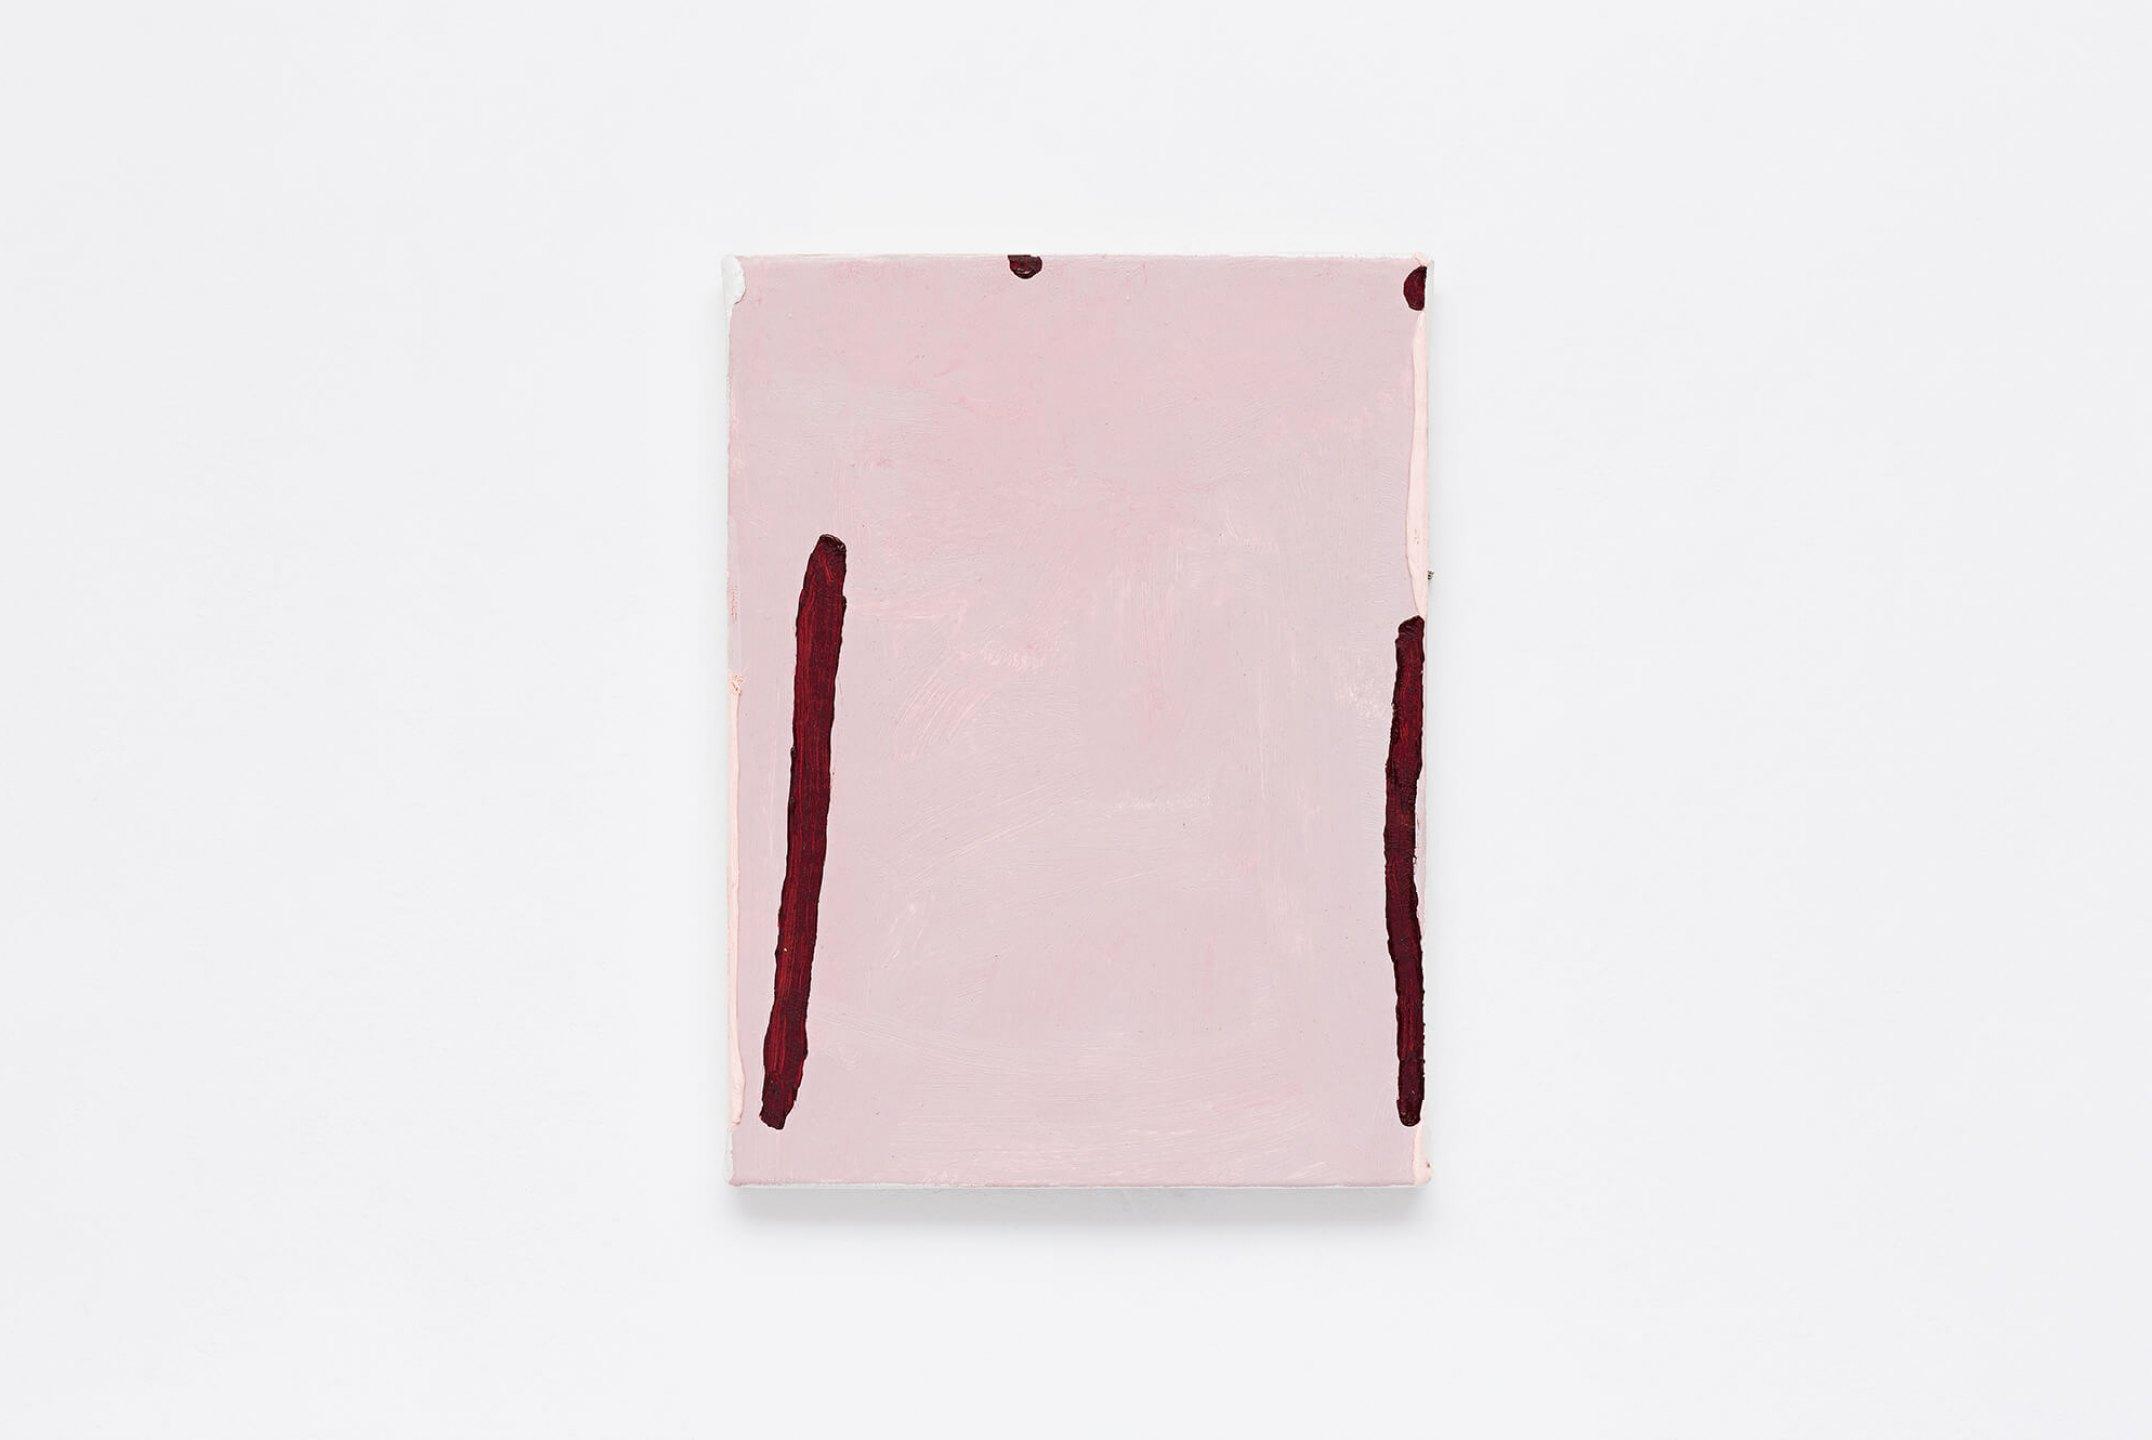 Paulo Monteiro,<em>untitled</em>, 2013, oil on linen, 23,5 × 18 cm - Mendes Wood DM